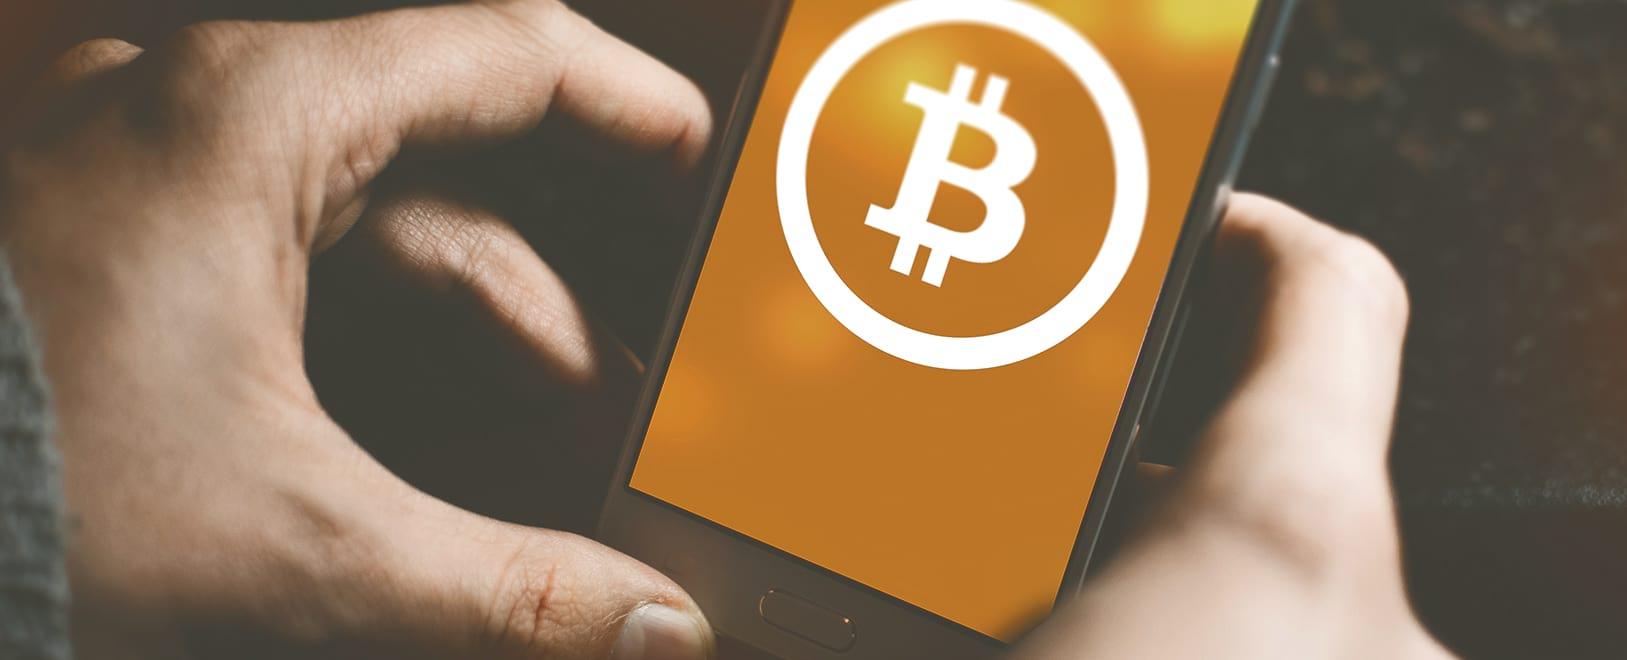 Best Bitcoin Wallet for Online Poker